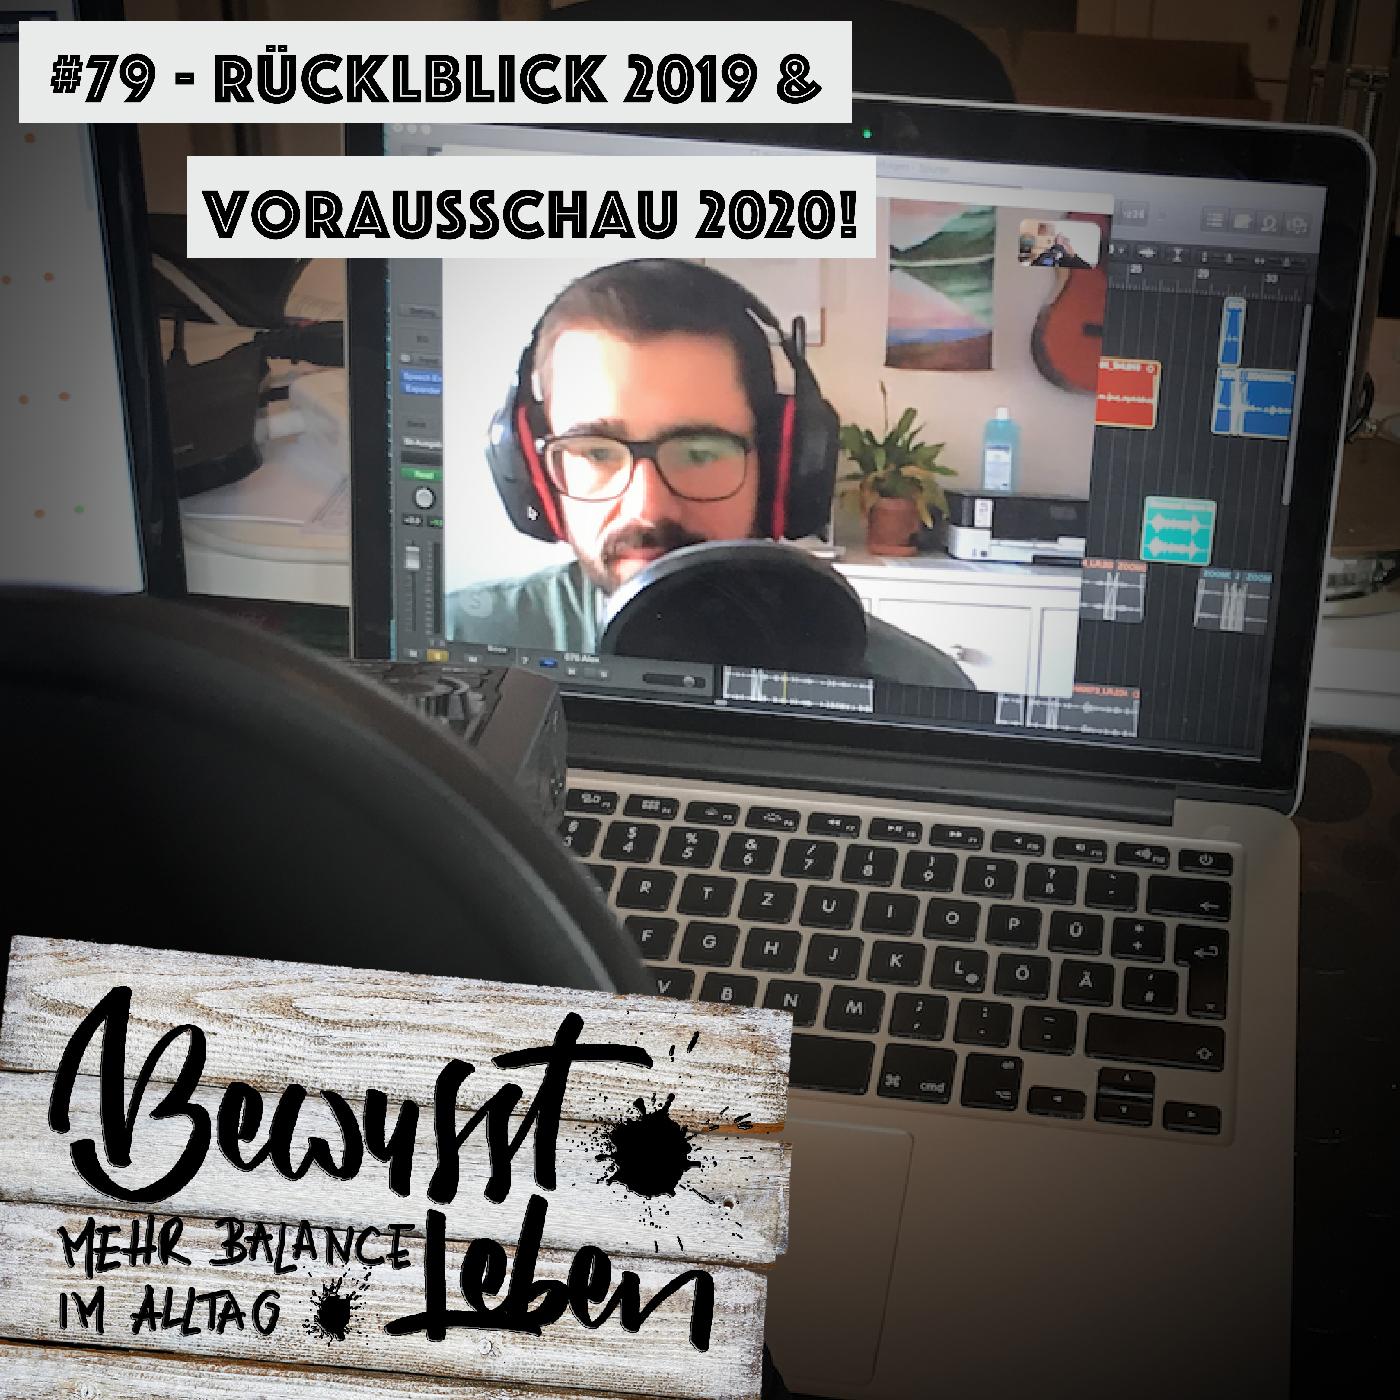 Rückblick 2019 & Vorausschau 2020